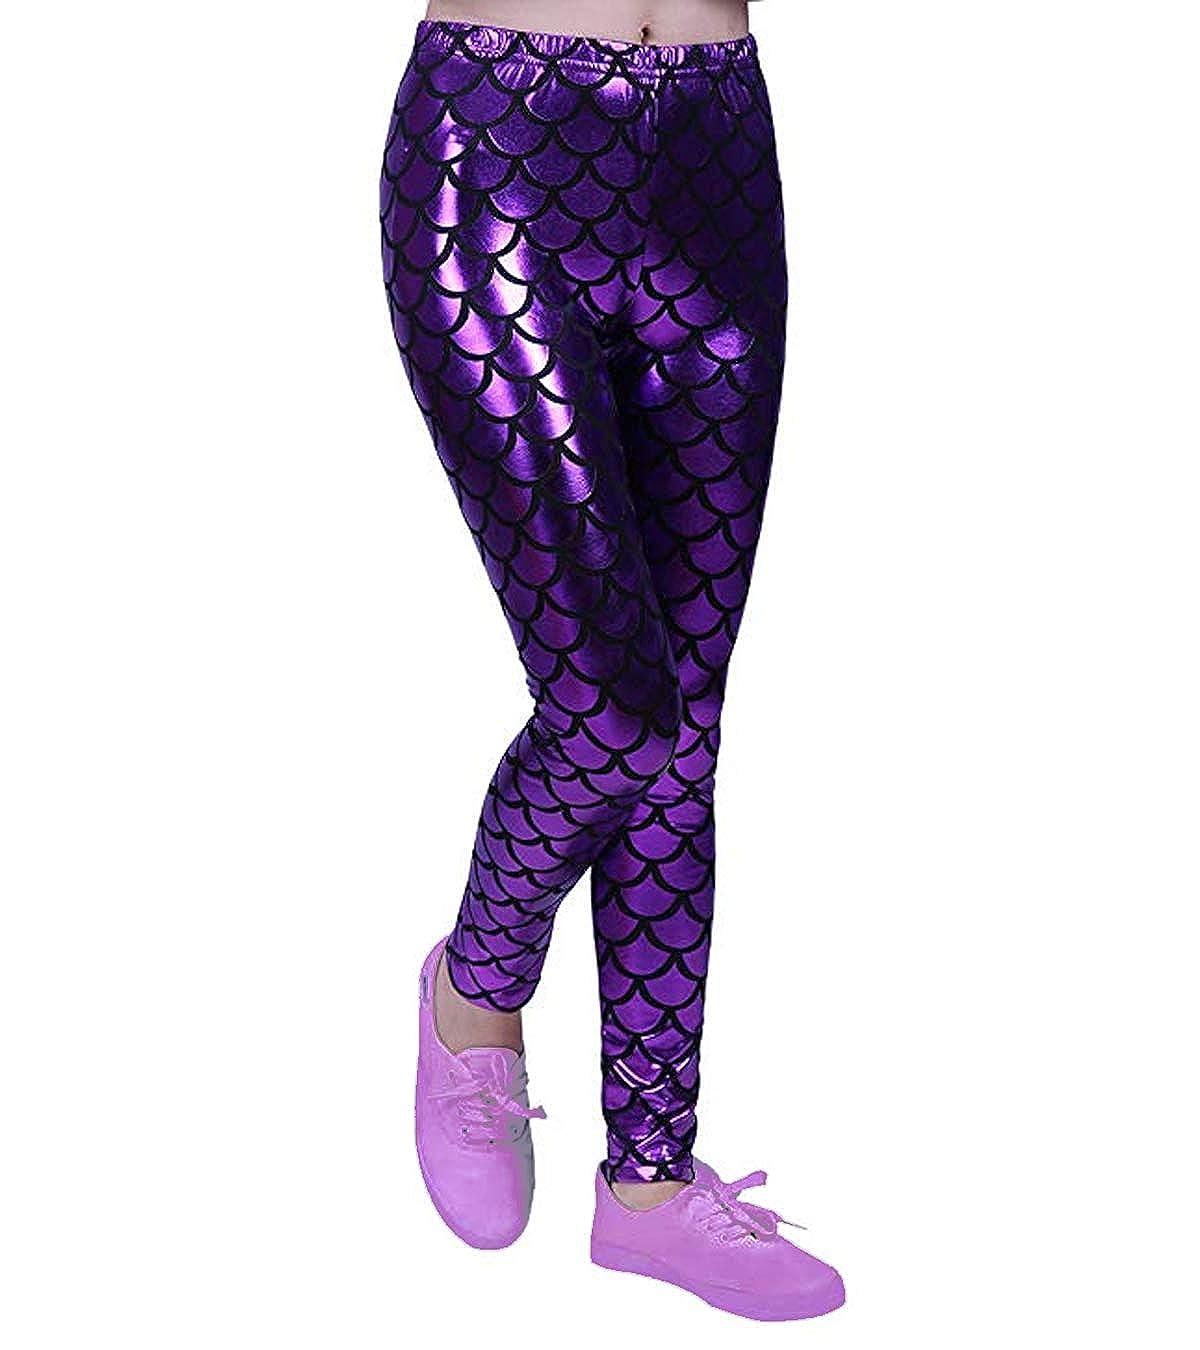 fashioncrazexx Girls Metallic Fish Scale Leggings Mermaid Kids Shiny Foil Childrens 3-13 Years